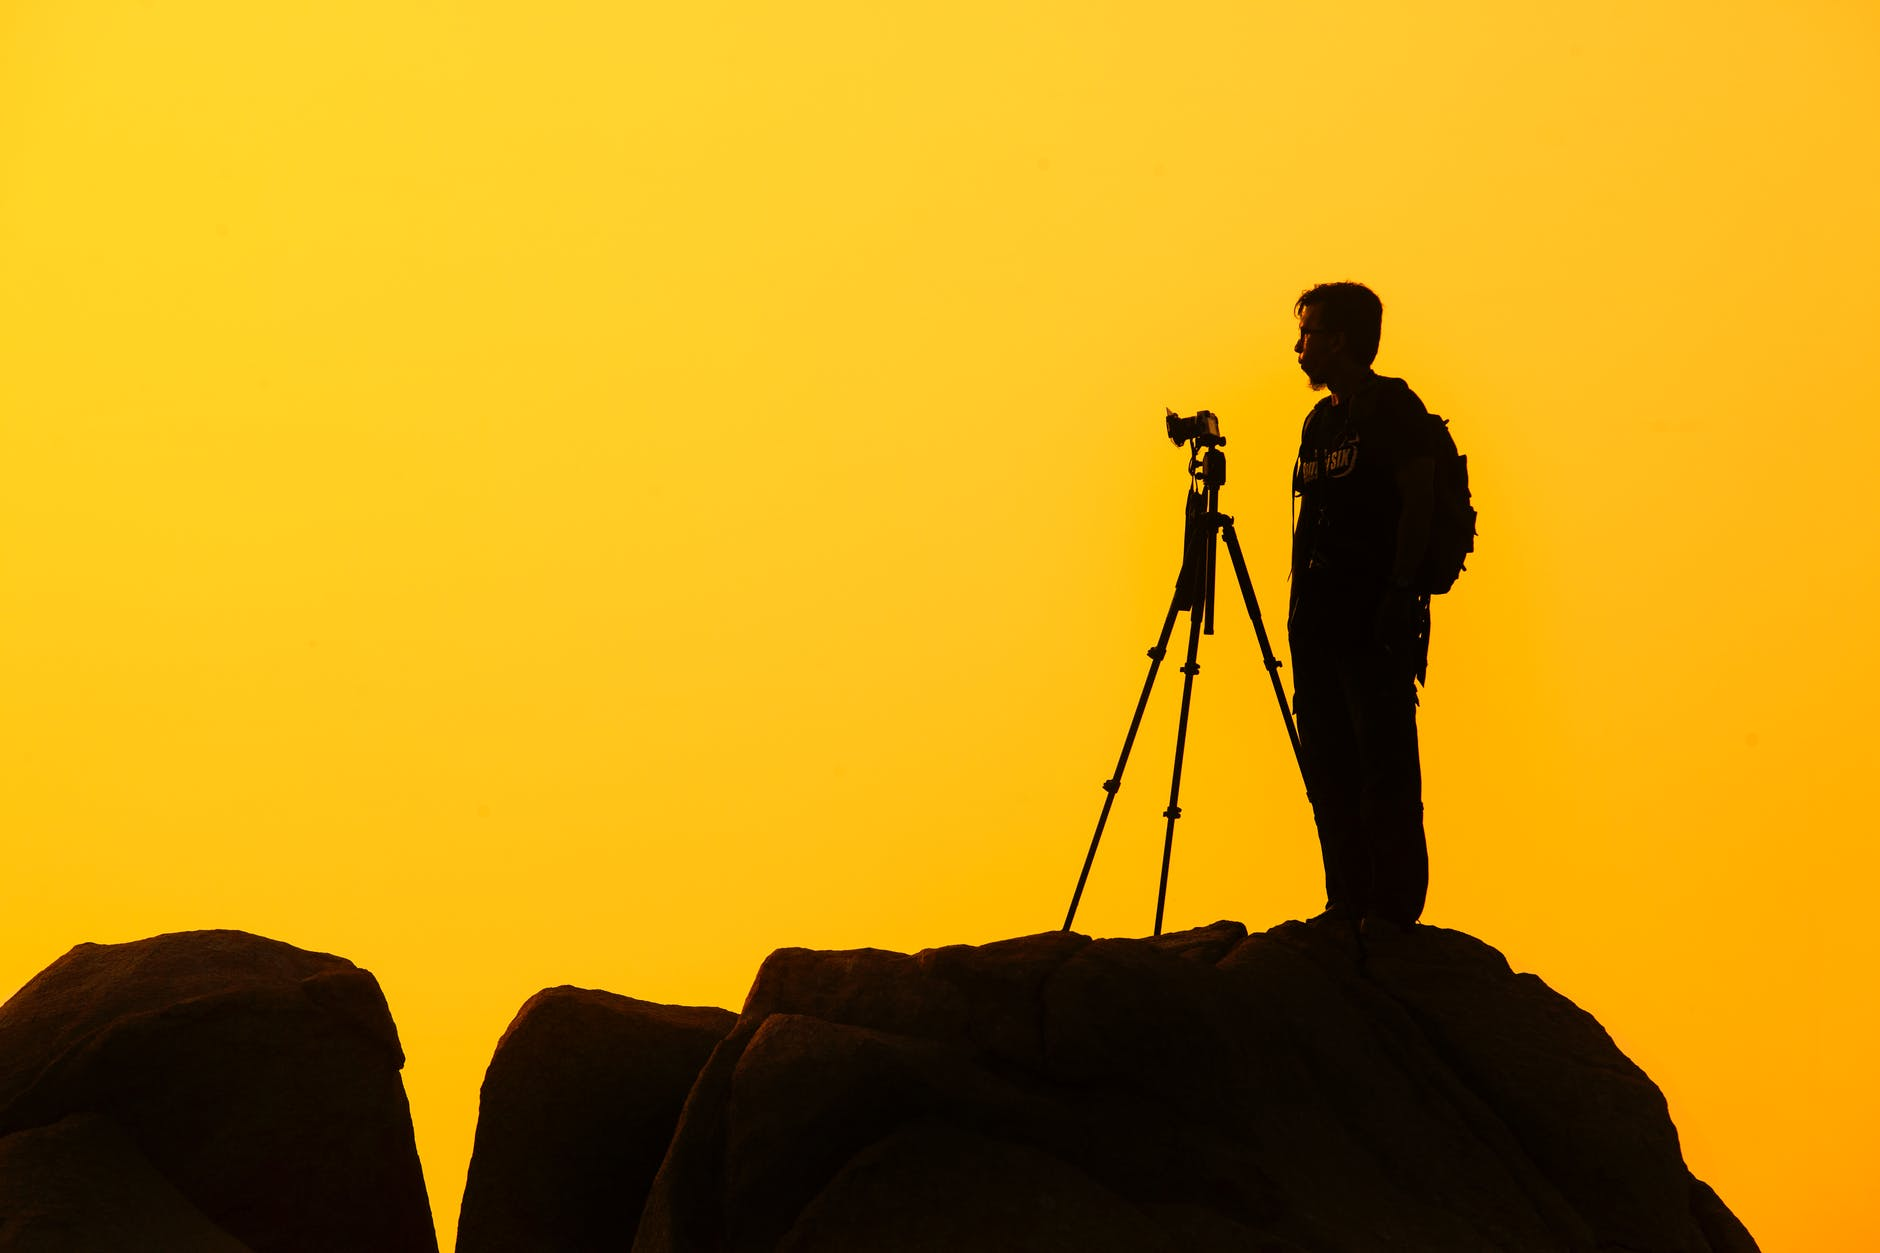 Principles of Photography principles of photography - thumbnail 1 - Principles of Photography